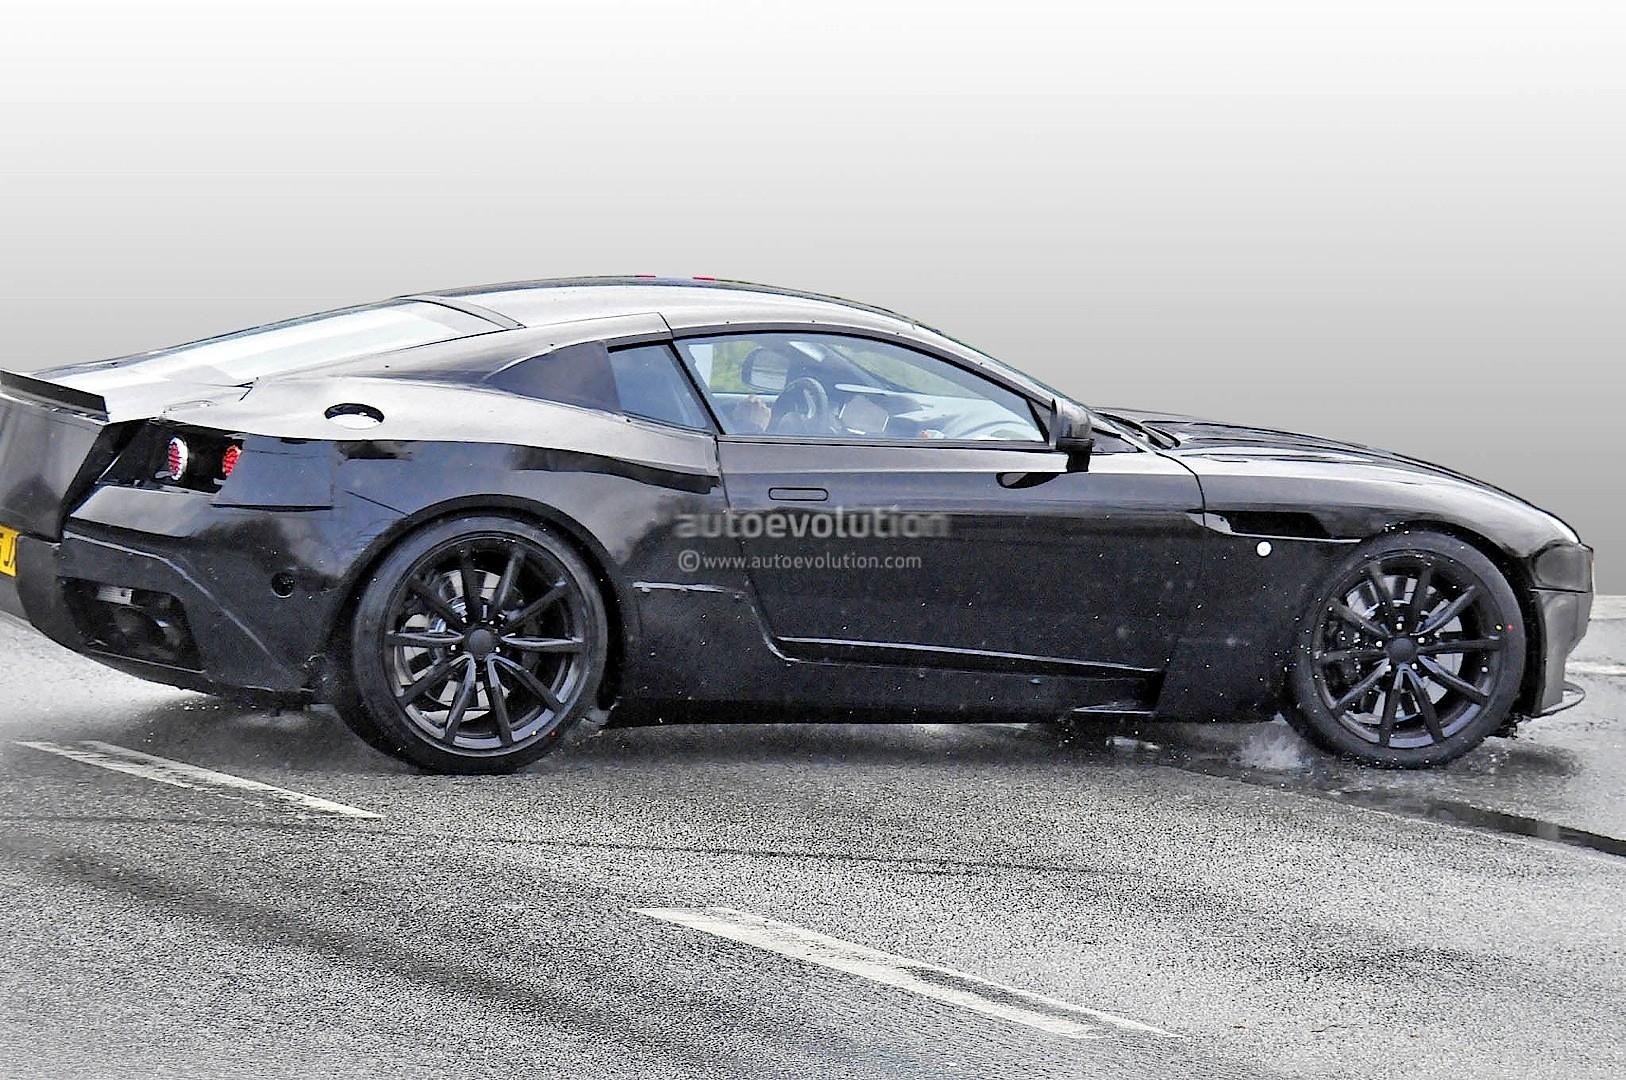 2016 - [Aston Martin] DB11 2017-aston-martin-db9-successor-prototype-spyshots-show-db10-like-silhouette-digital-dashboard-intercoolers_2